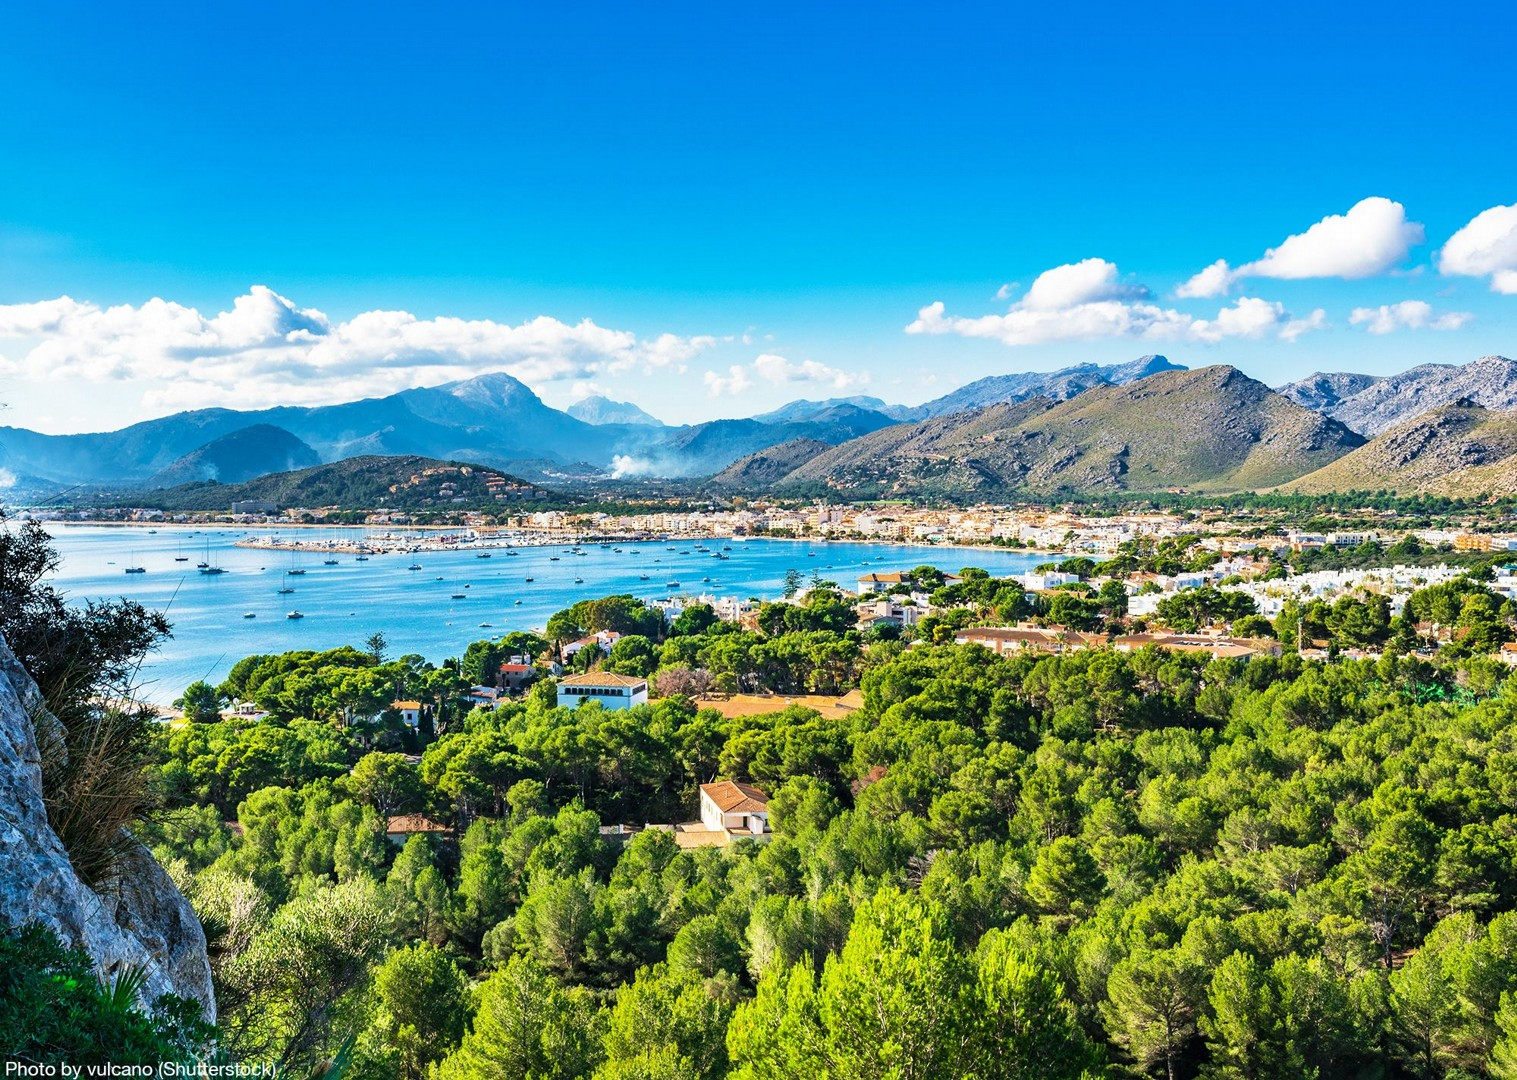 port-de-pollença-mallorca-beautiful-self-guided-cycling.jpg - Spain - Mallorca - Self-Guided Leisure Cycling Holiday - Leisure Cycling